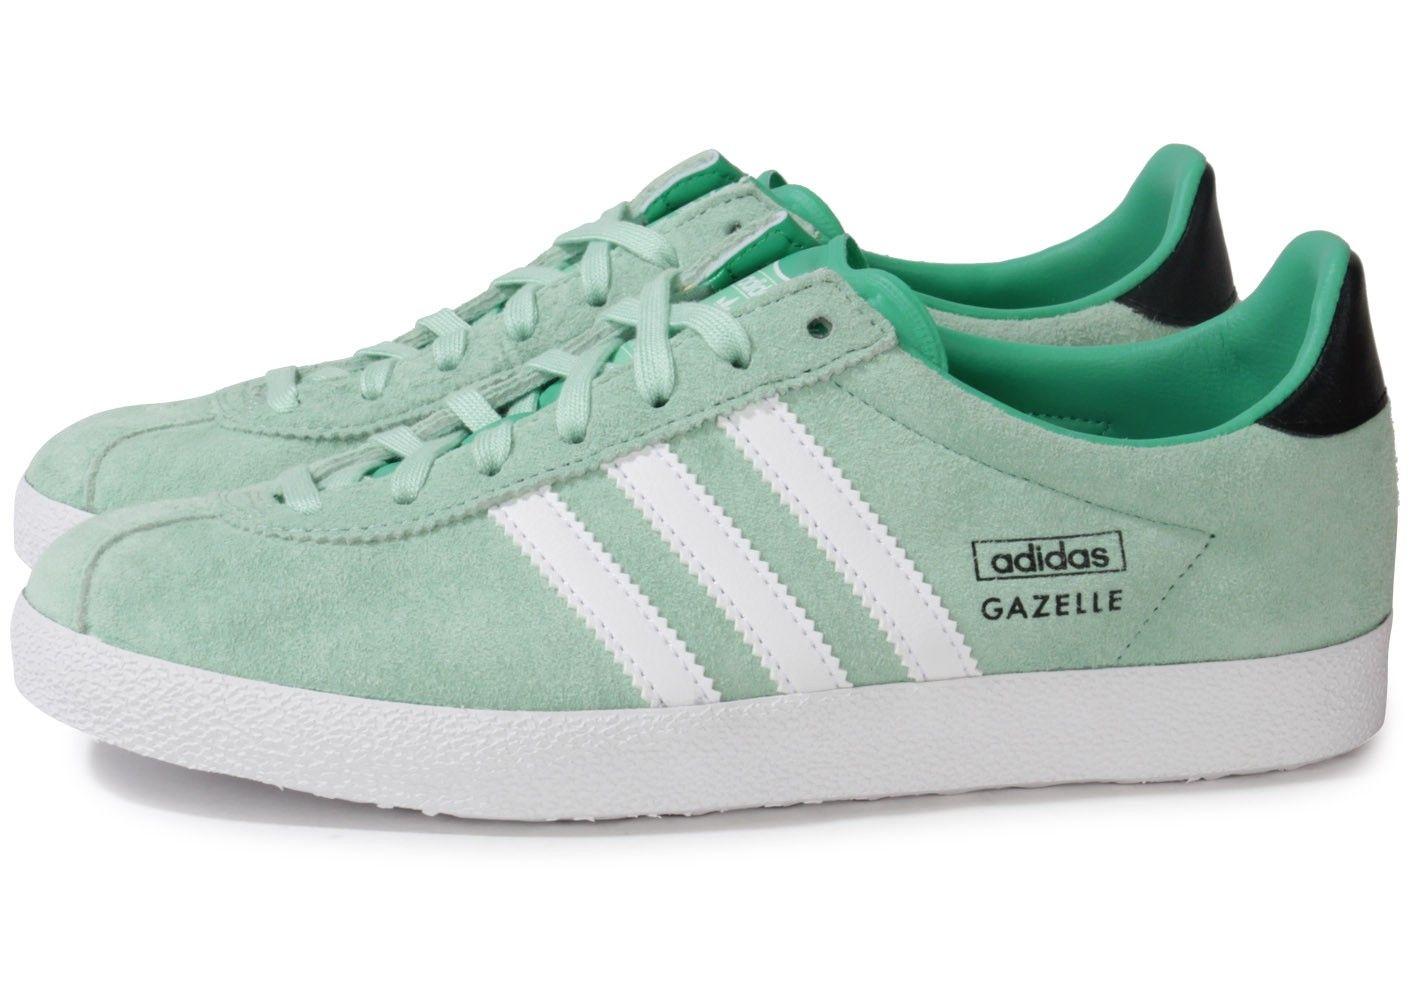 gazelle adidas vert d'eau